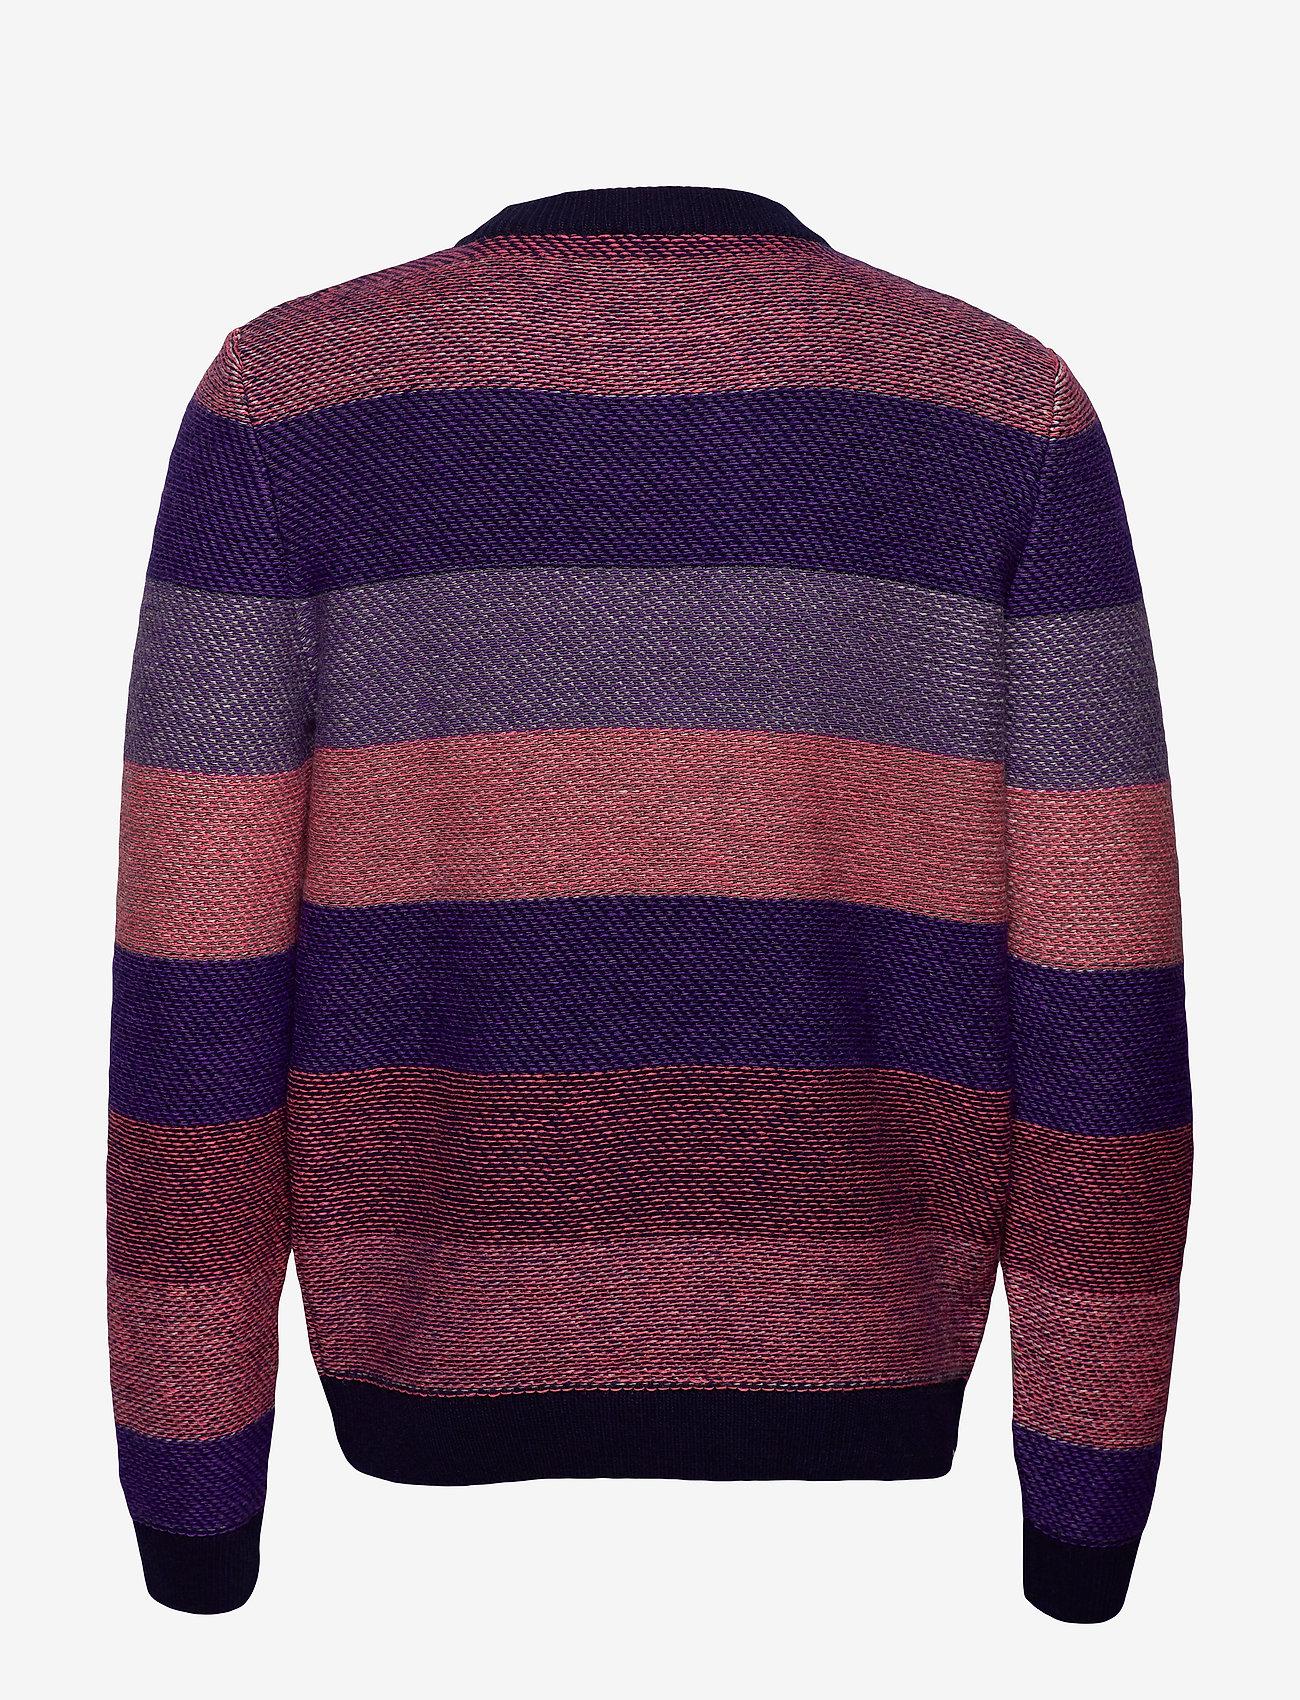 Multi Colored Striped O-neck Knit - (Total Eclipse) - Knowledge Cotton Apparel tteGrx